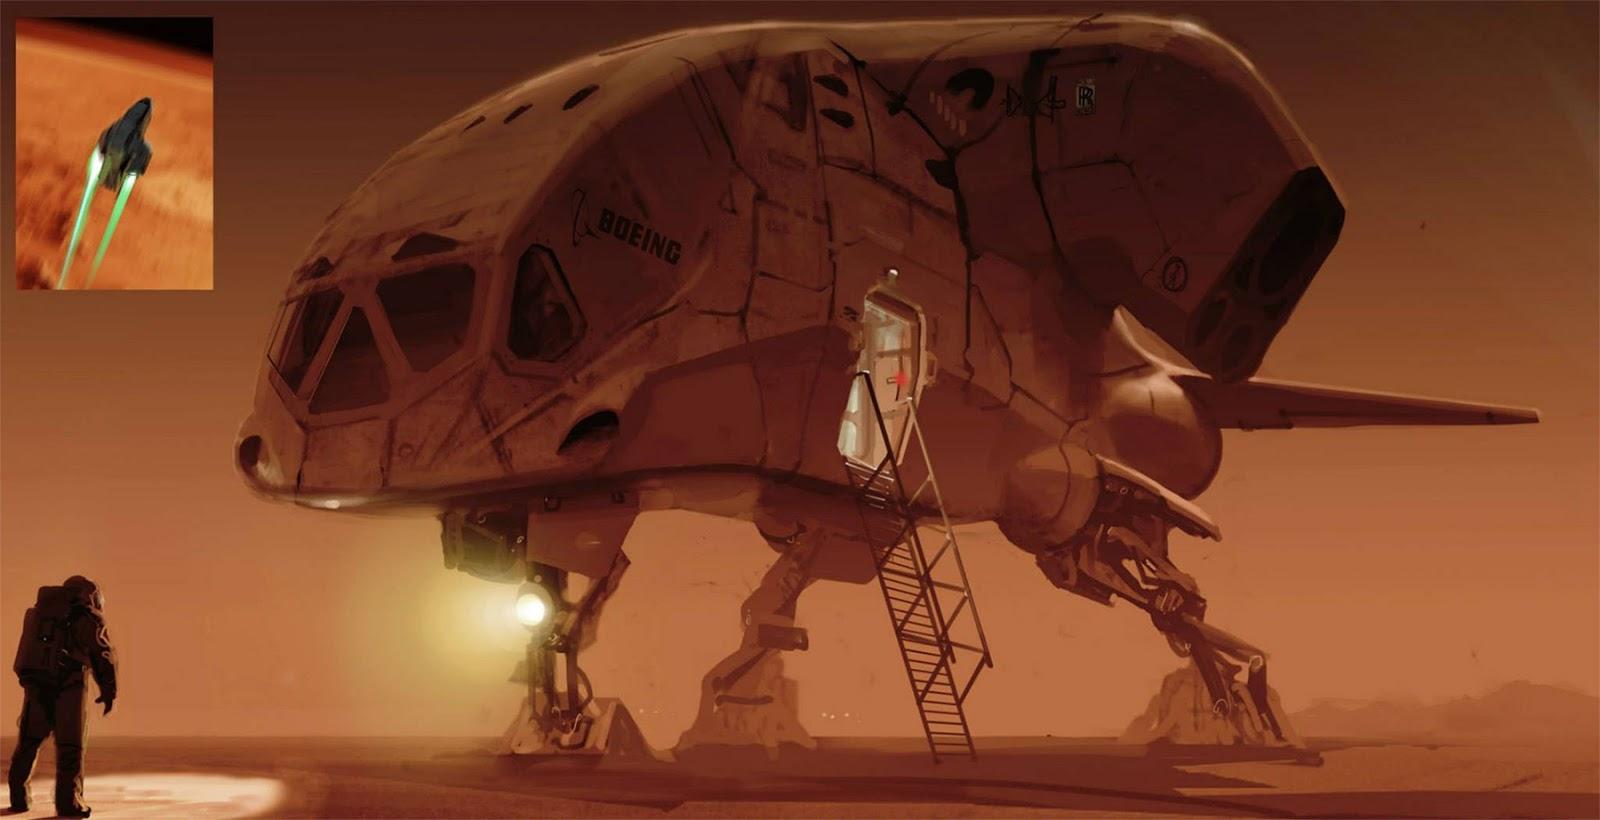 boeing-mars-lander-by-ruairi-robinson